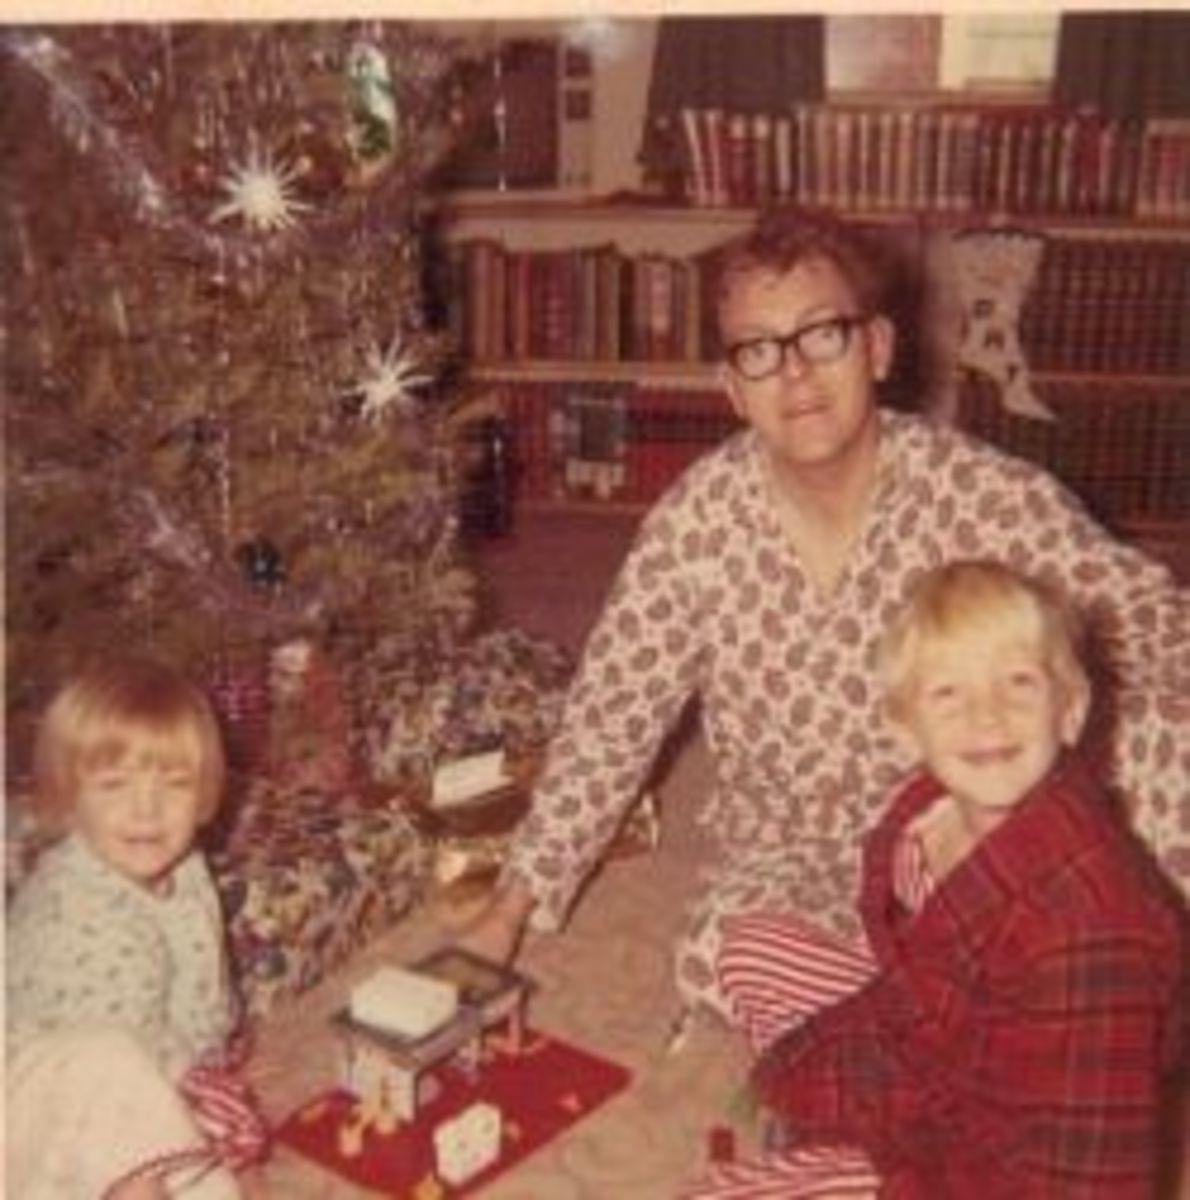 Christmas 1968 in Lincoln, Nebraska